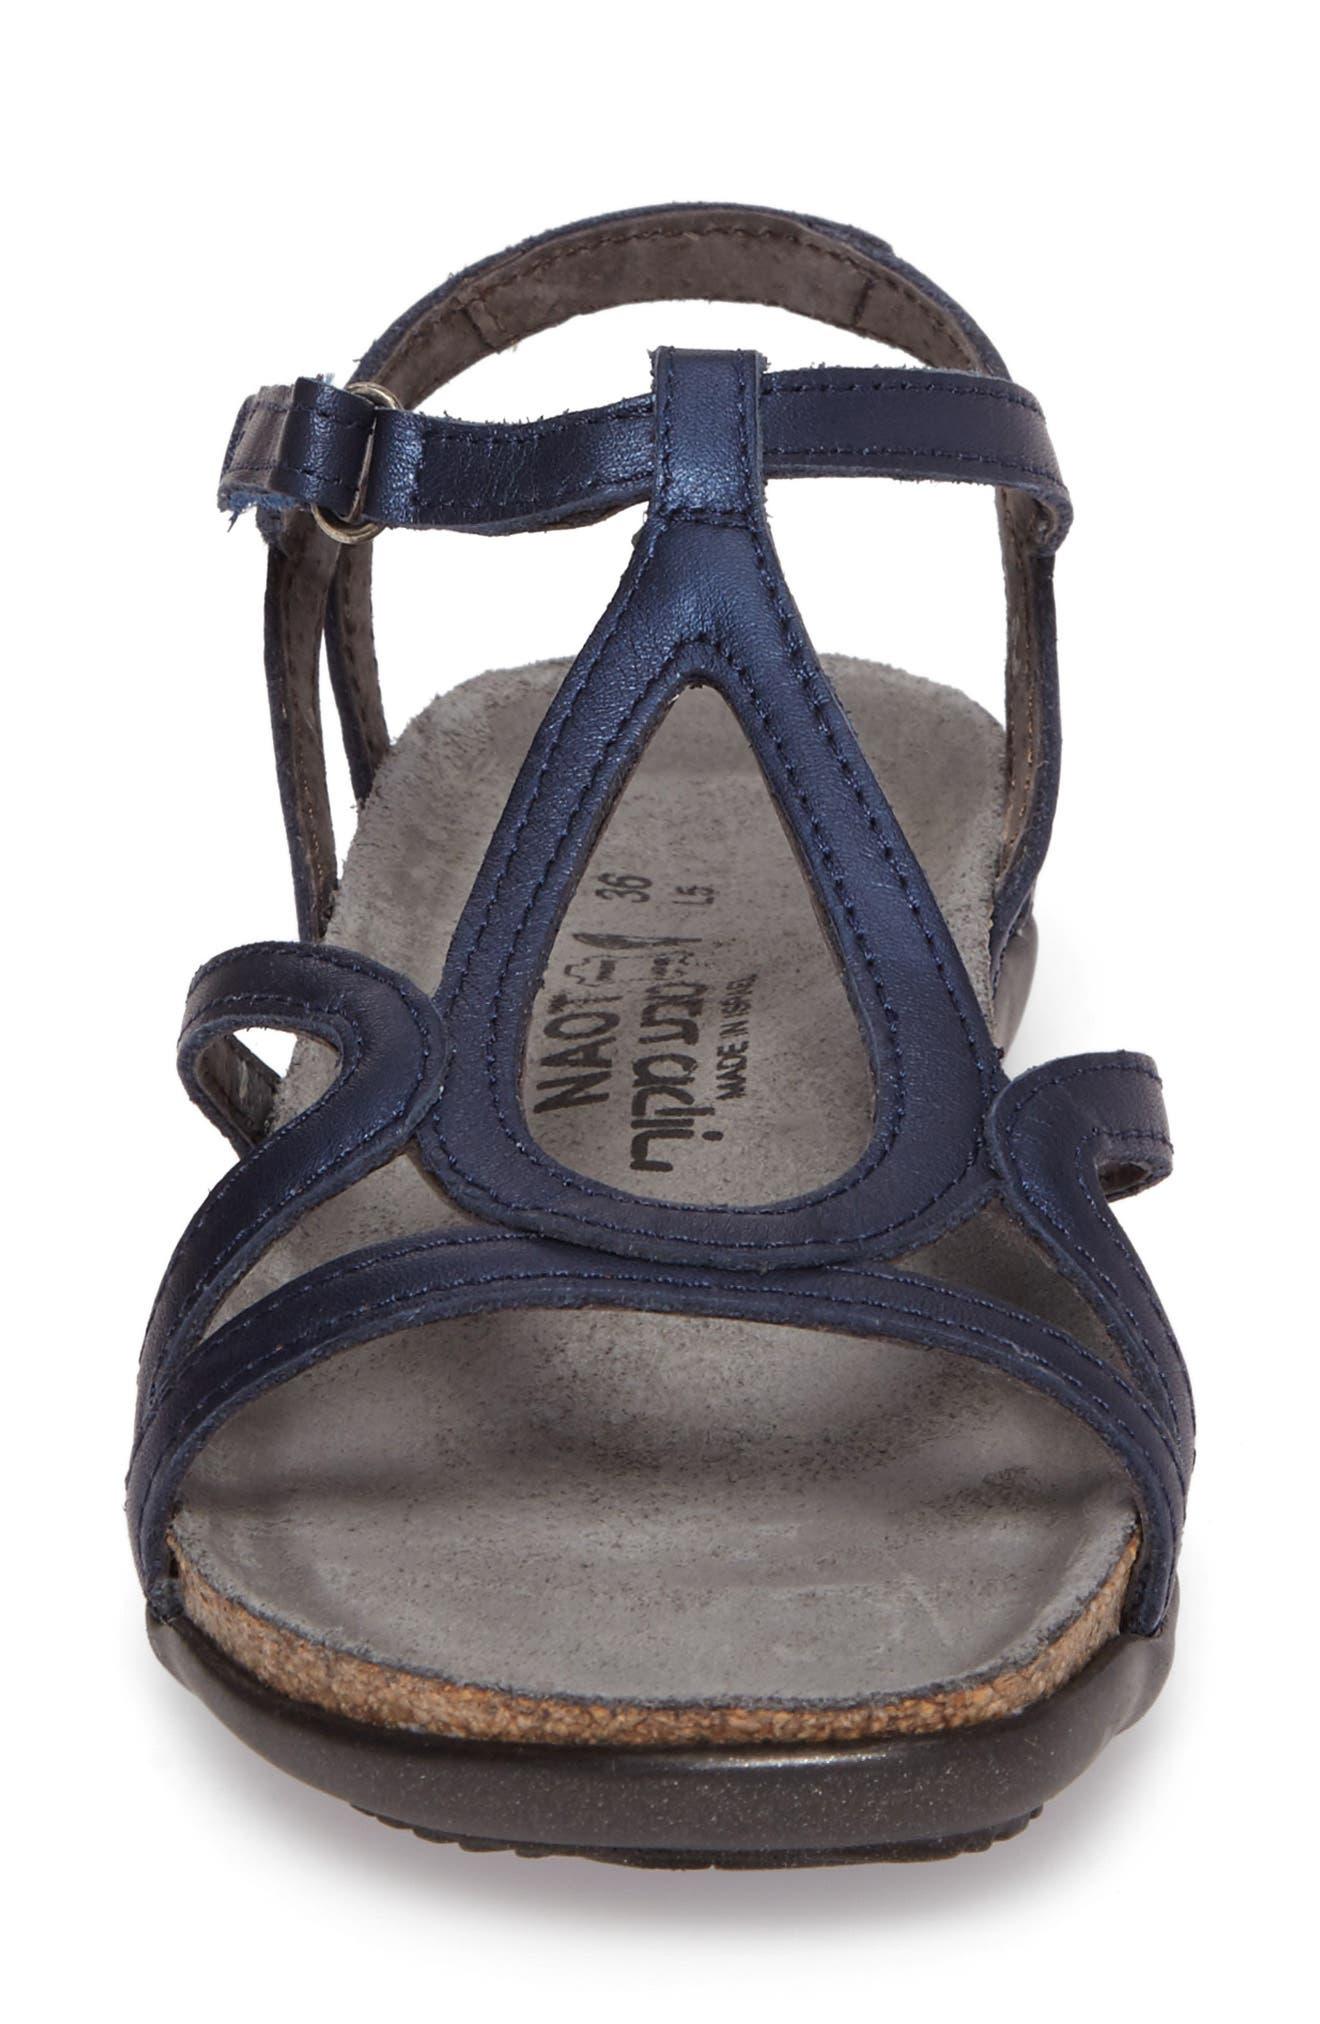 'Dorith' Sandal,                             Alternate thumbnail 4, color,                             POLAR SEA LEATHER